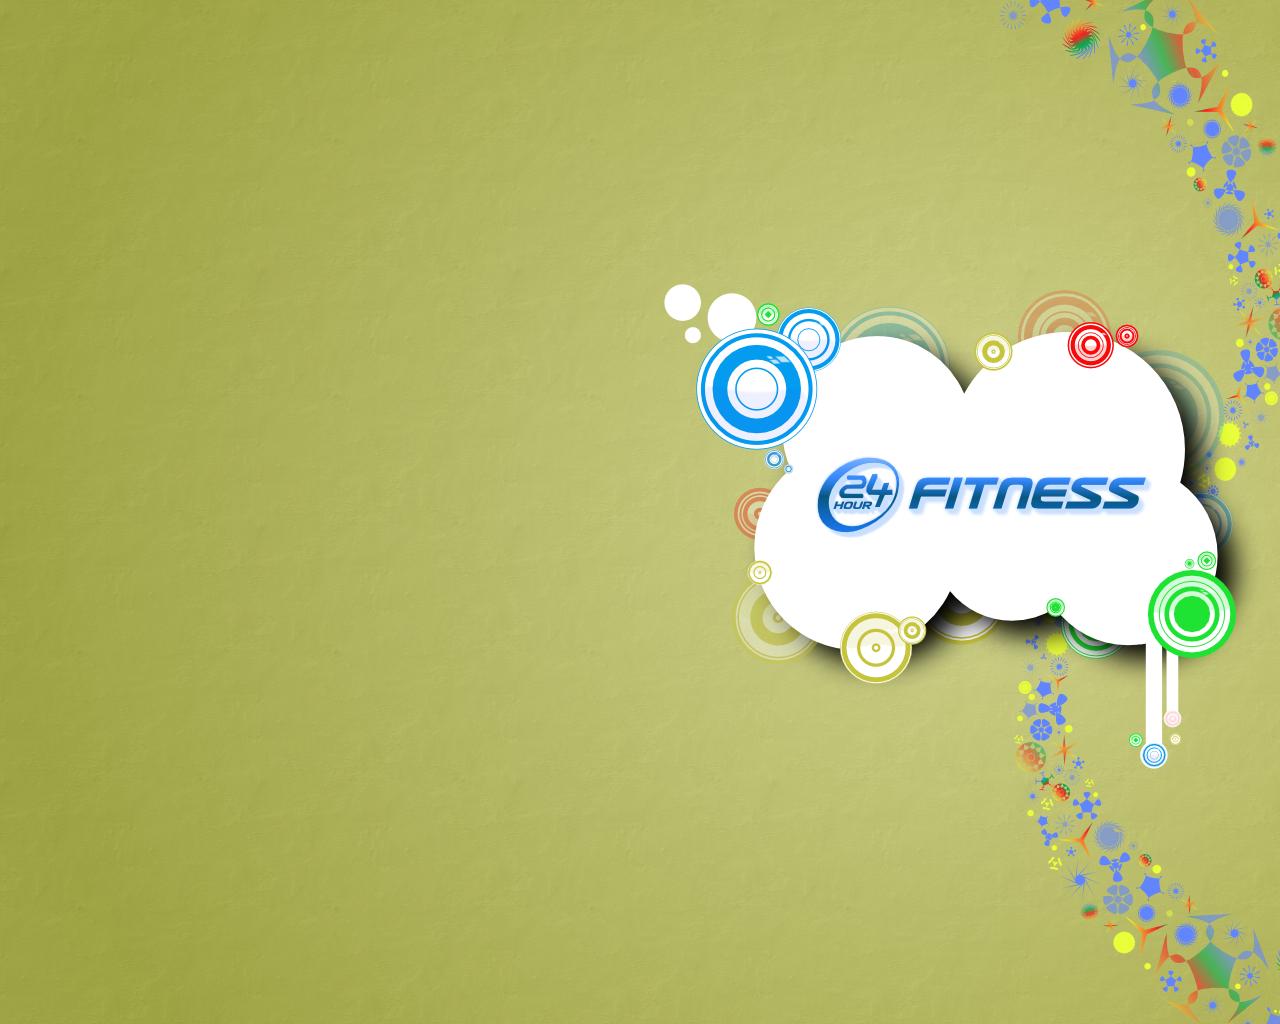 Fitness Desktop Wallpaper 2 Background Wallpaper Wallpaper 1280x1024